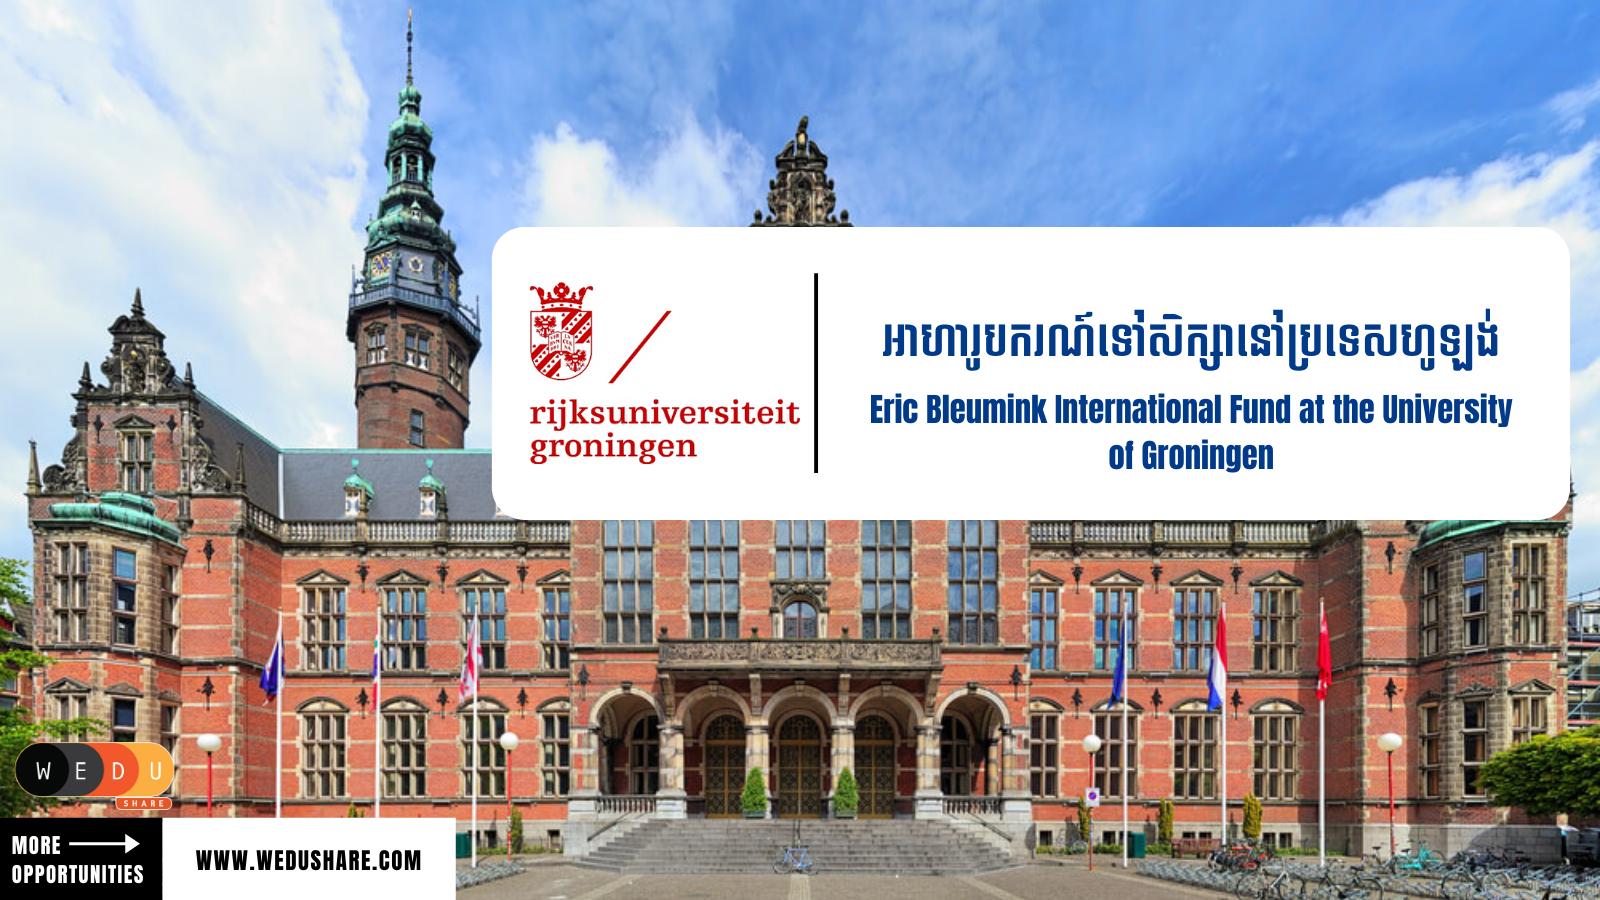 Eric Bleumink International Fund at the University of Groningen